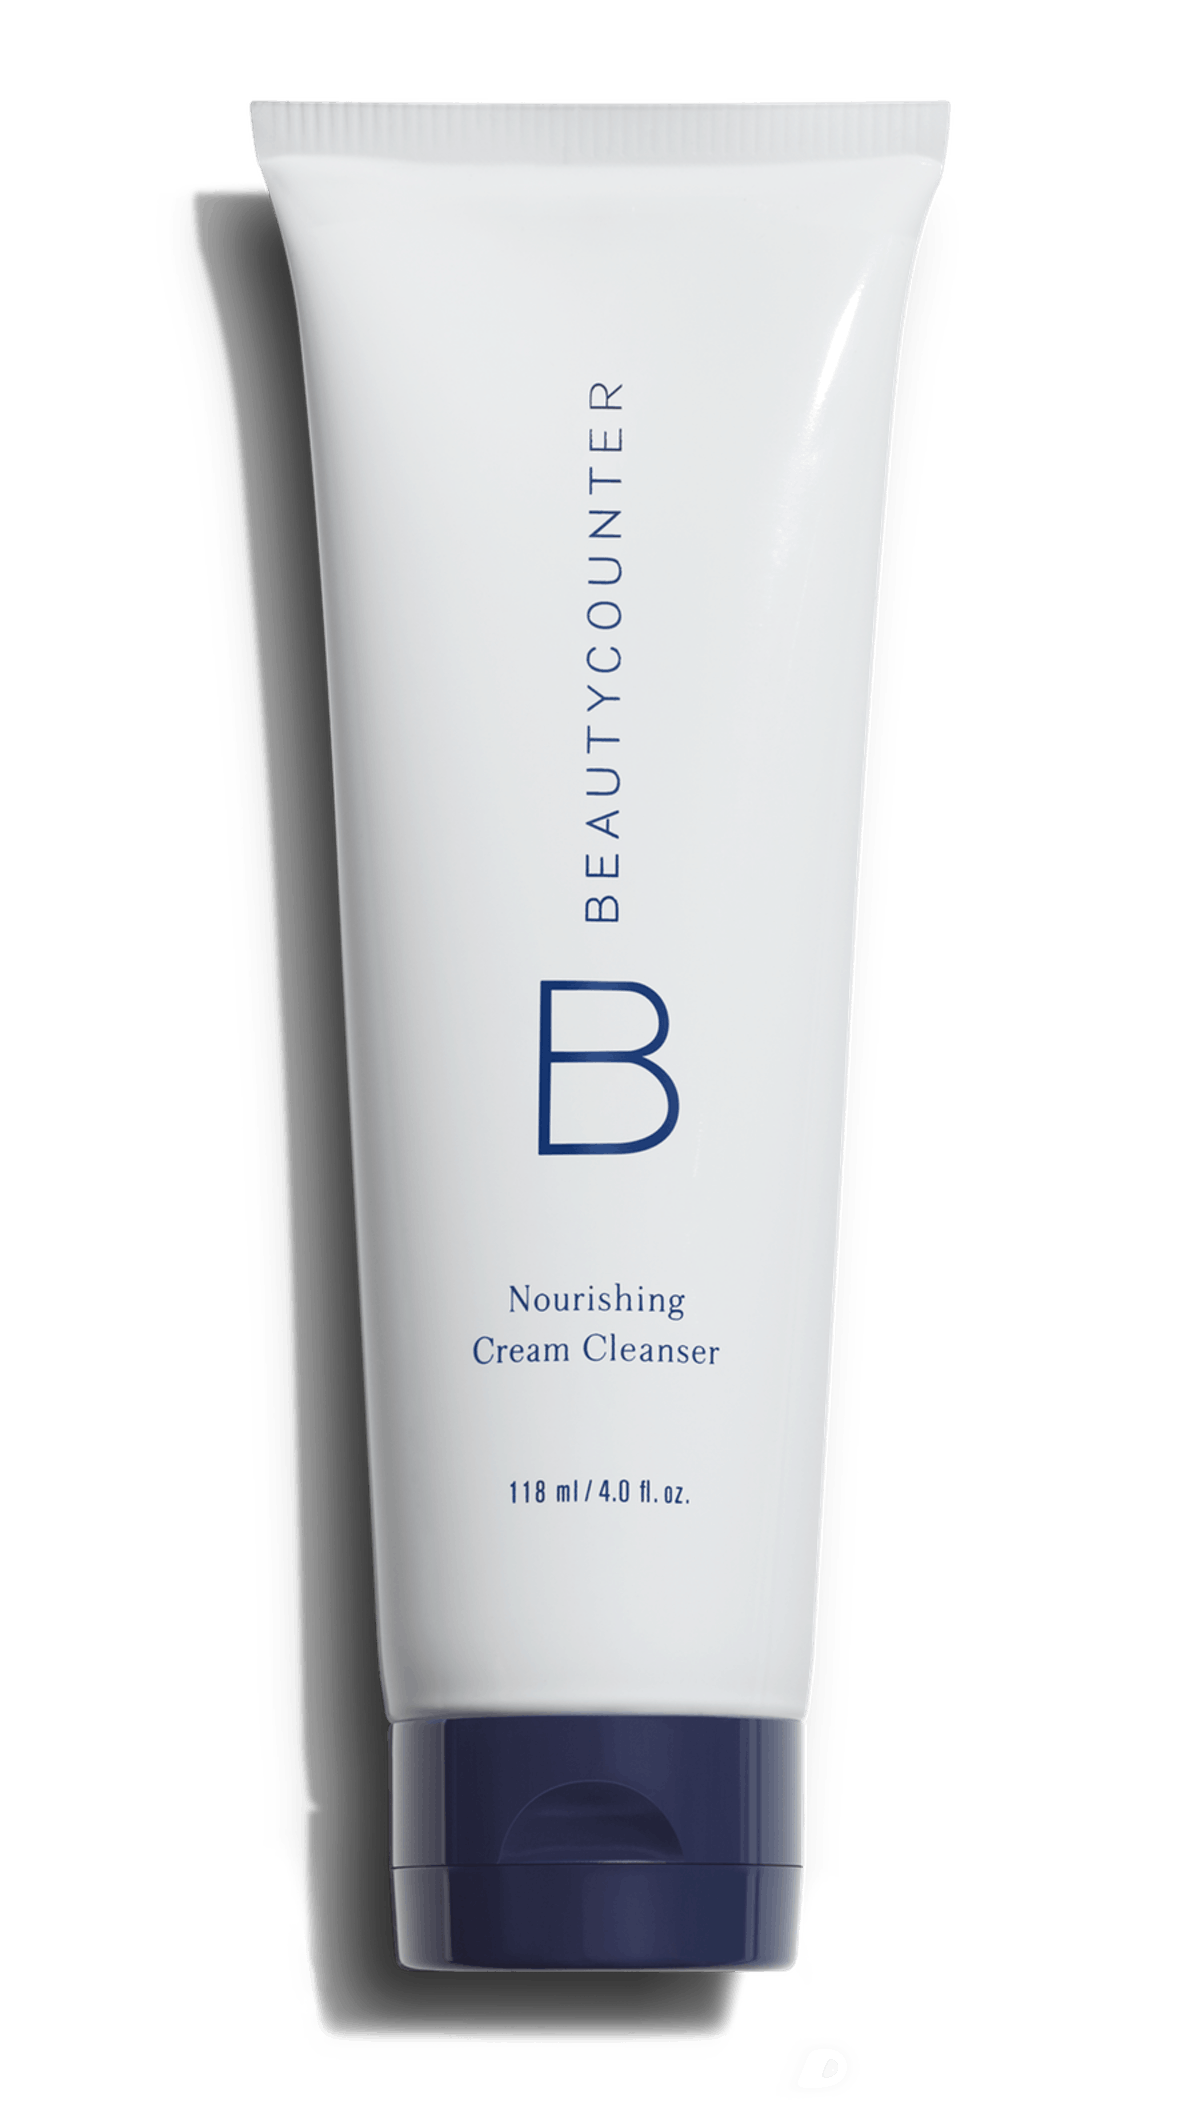 Nourishing Cream Cleanser